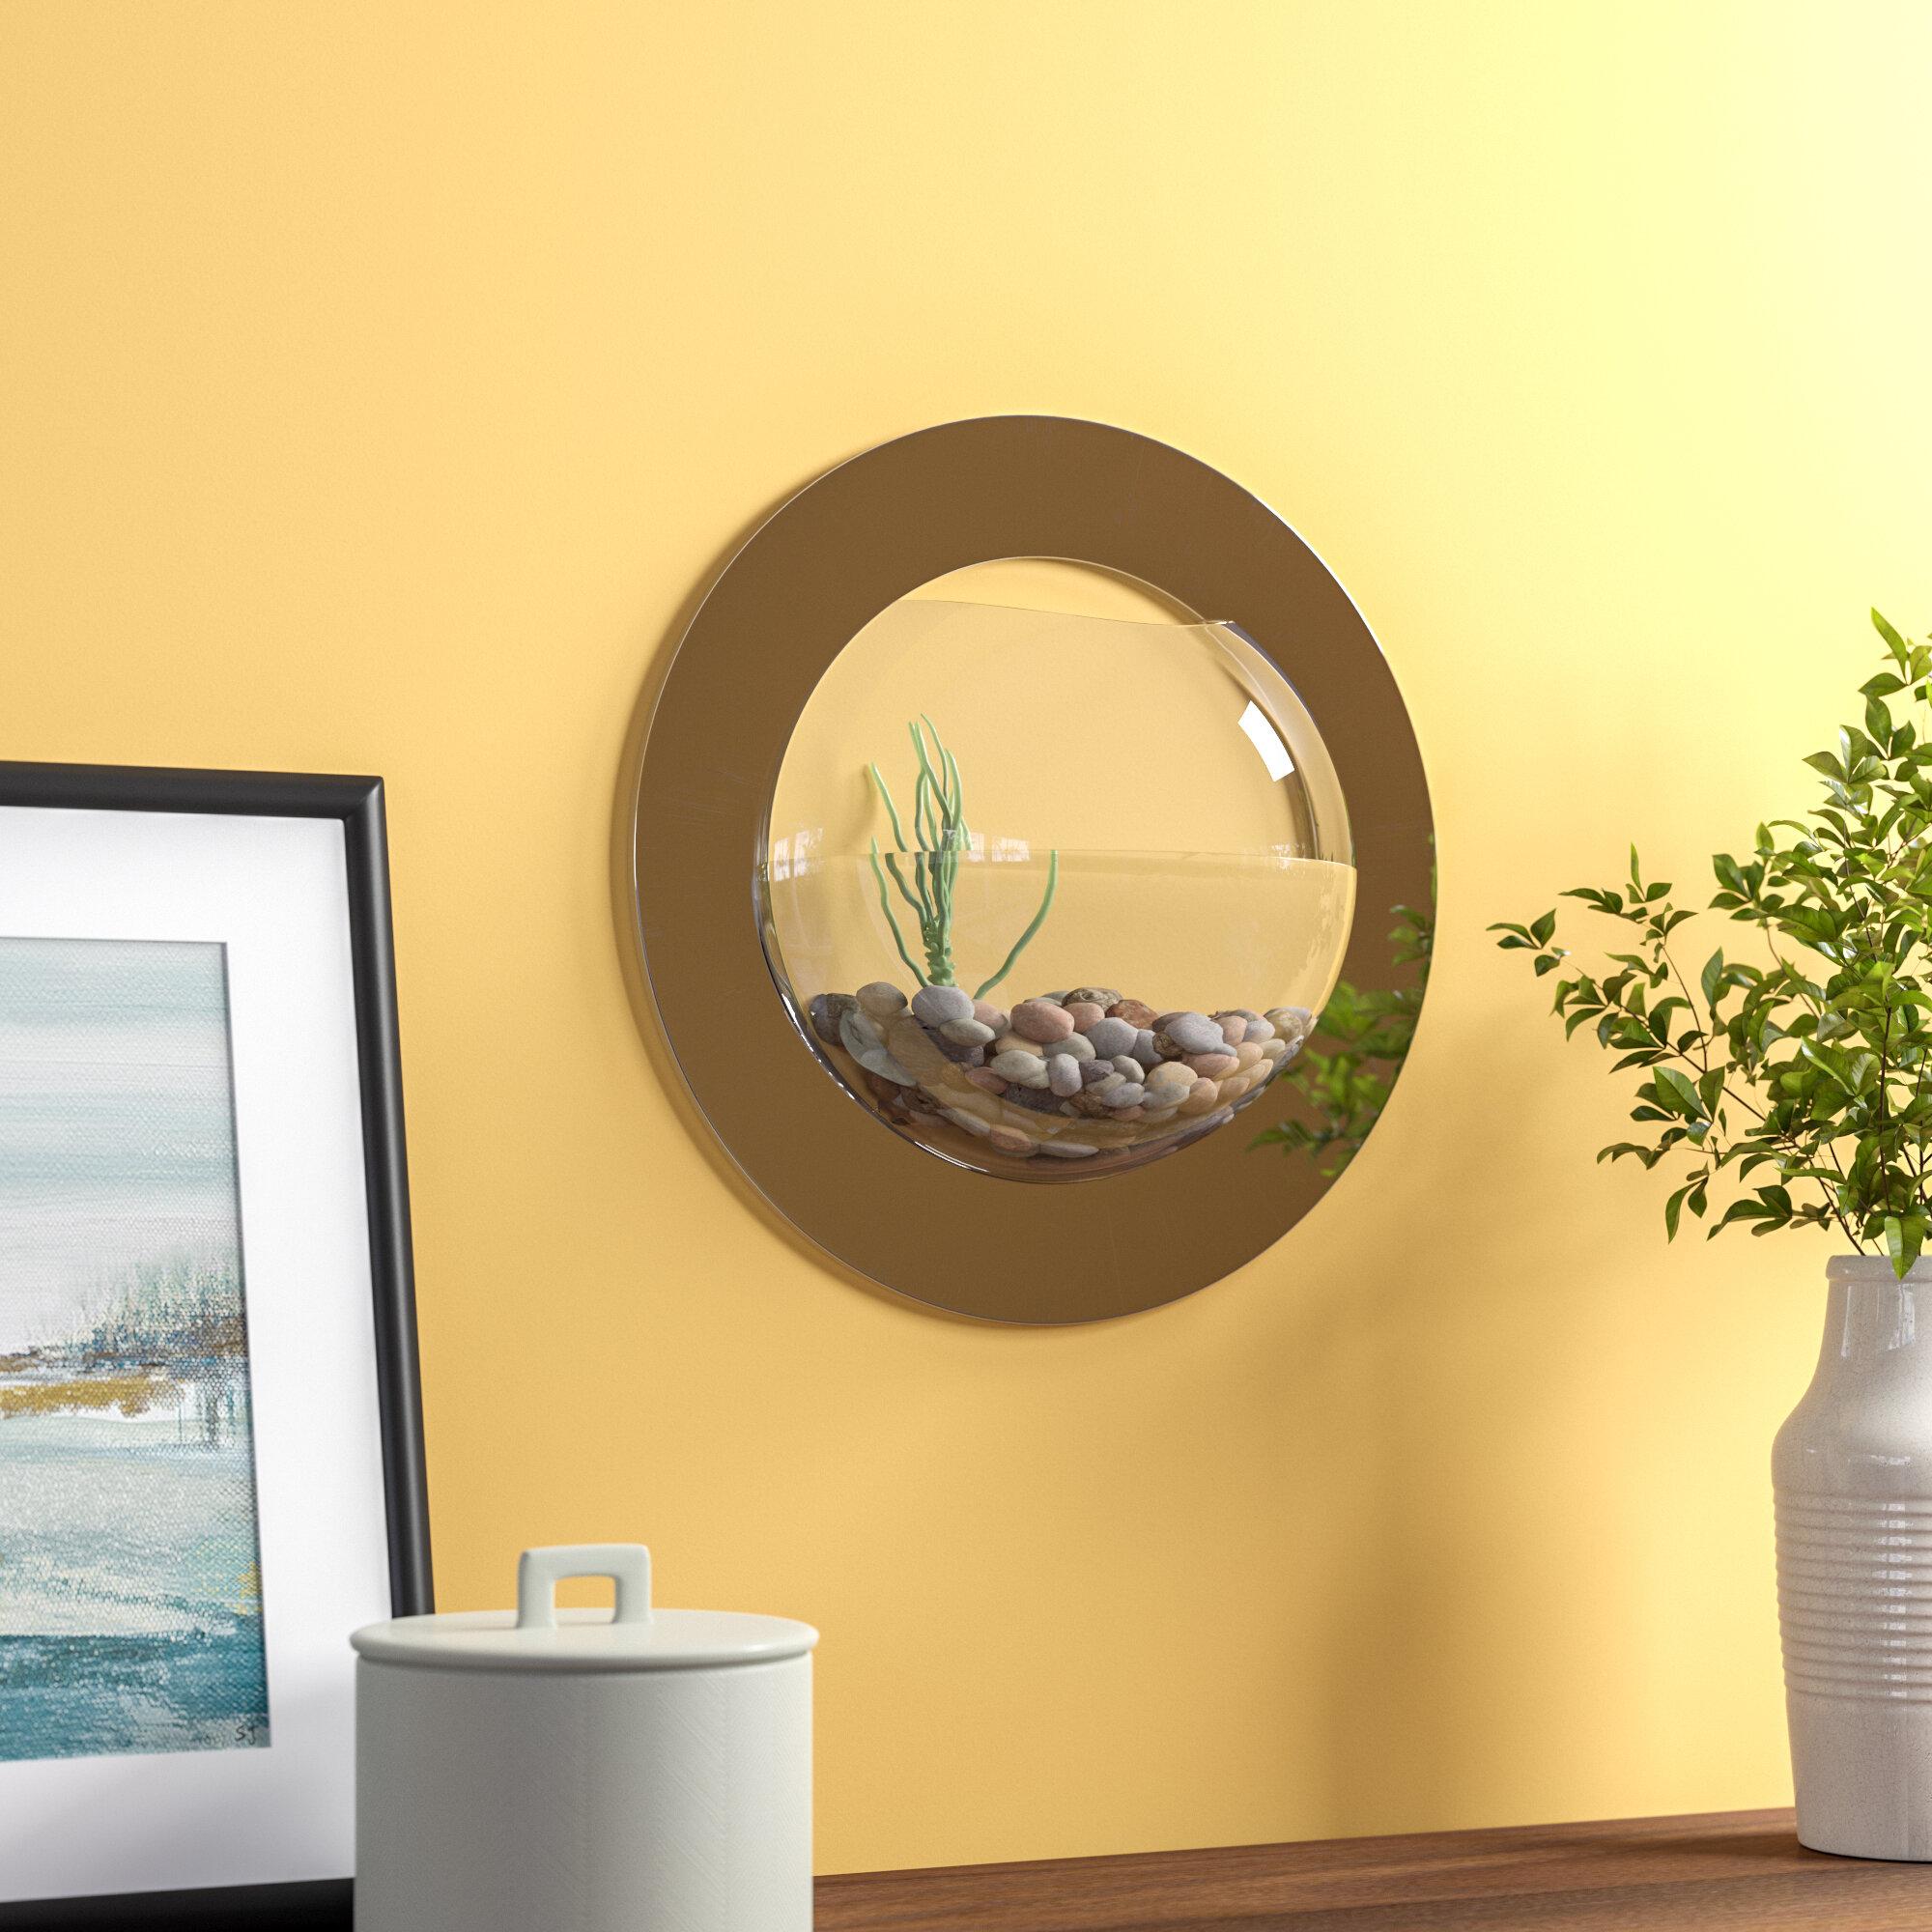 Archie Oscar Beagle 1 Gallon Reflection Fish Bubble Deluxe Mirrored Wall Mounted Aquarium Tank Reviews Wayfair